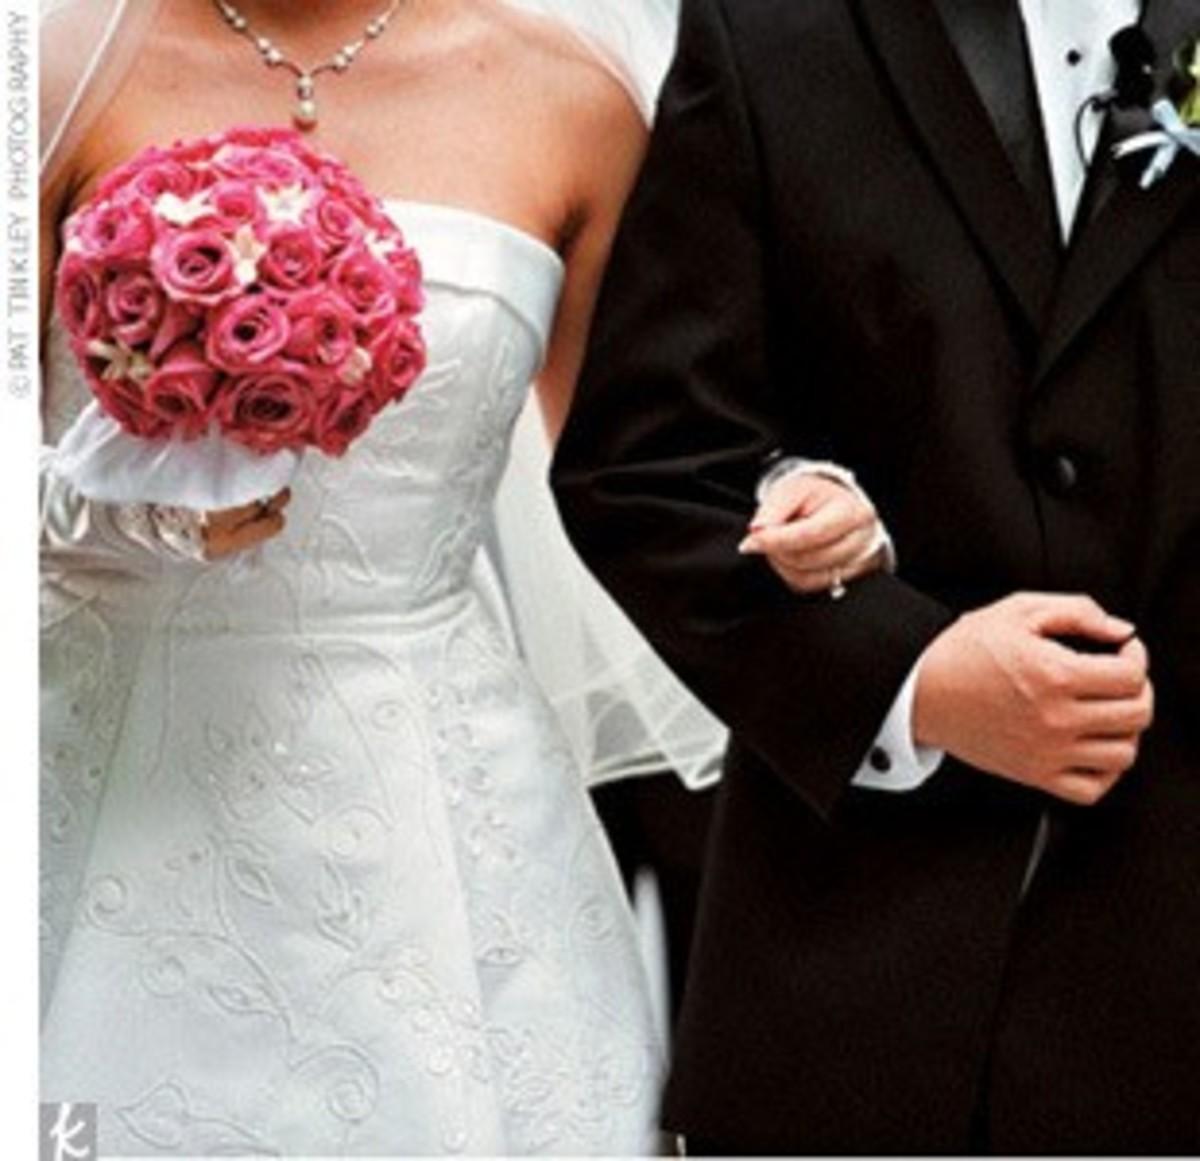 photo credit: weddingbycolor.com